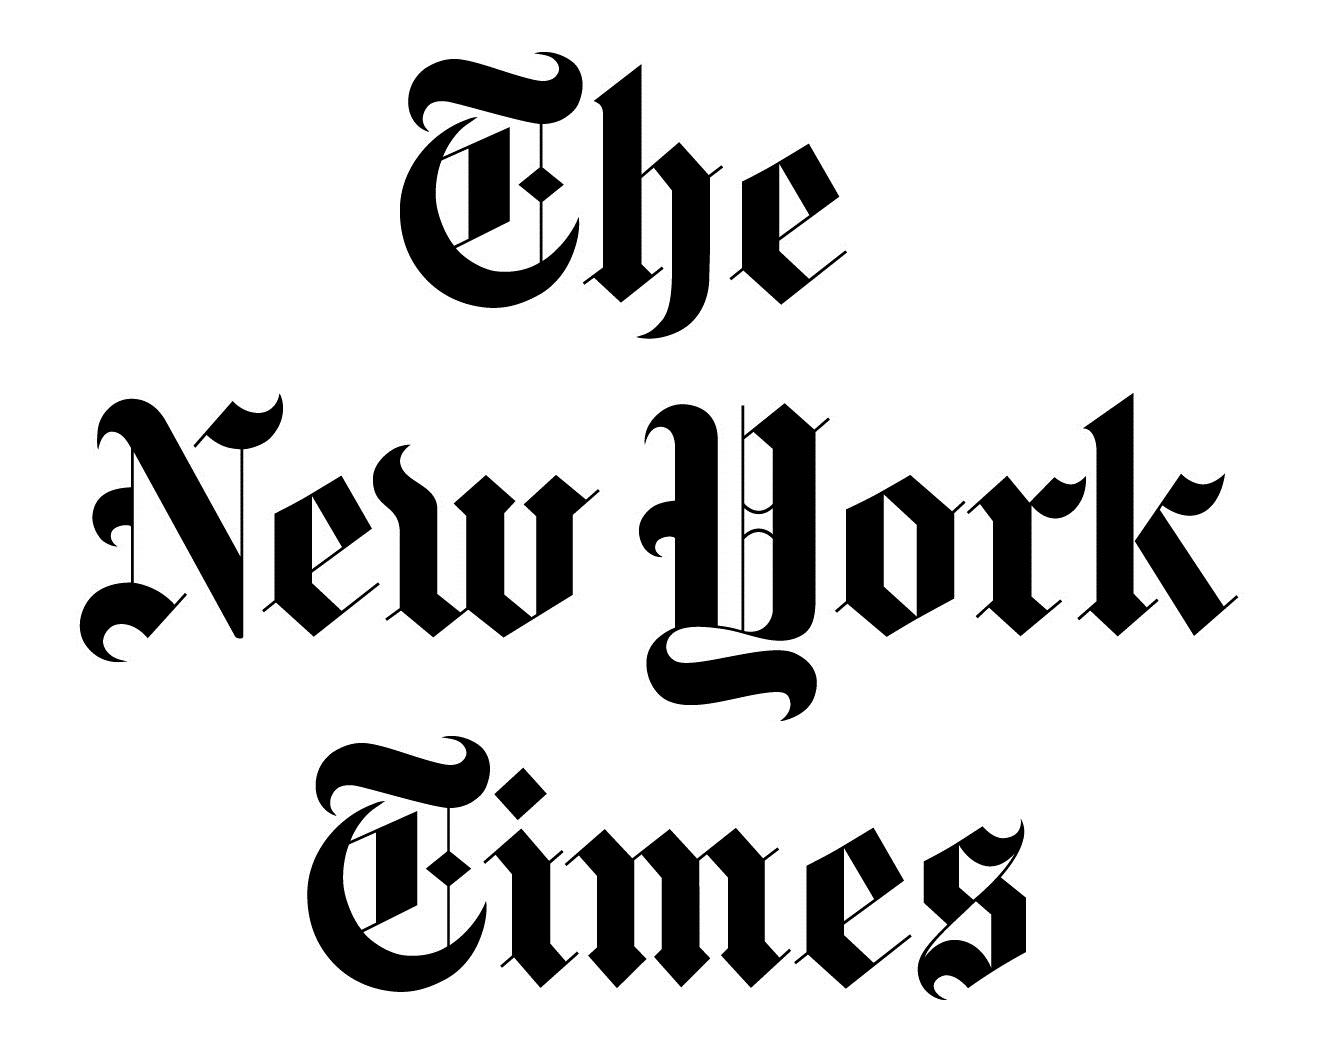 New_York_Times_logo.jpg